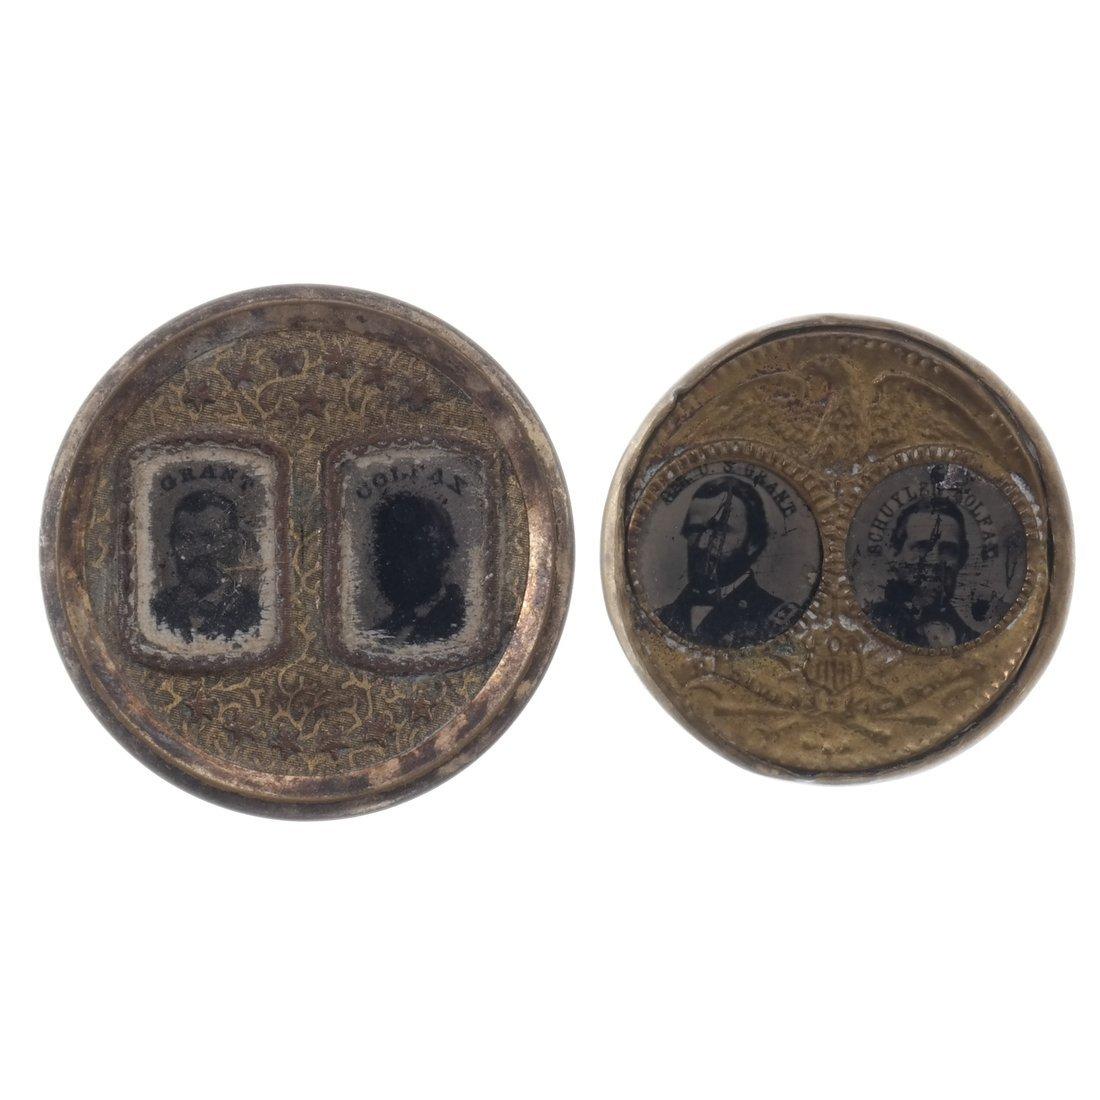 Grant & Colfax Two 1868 Jugate Ferrotypes - 2